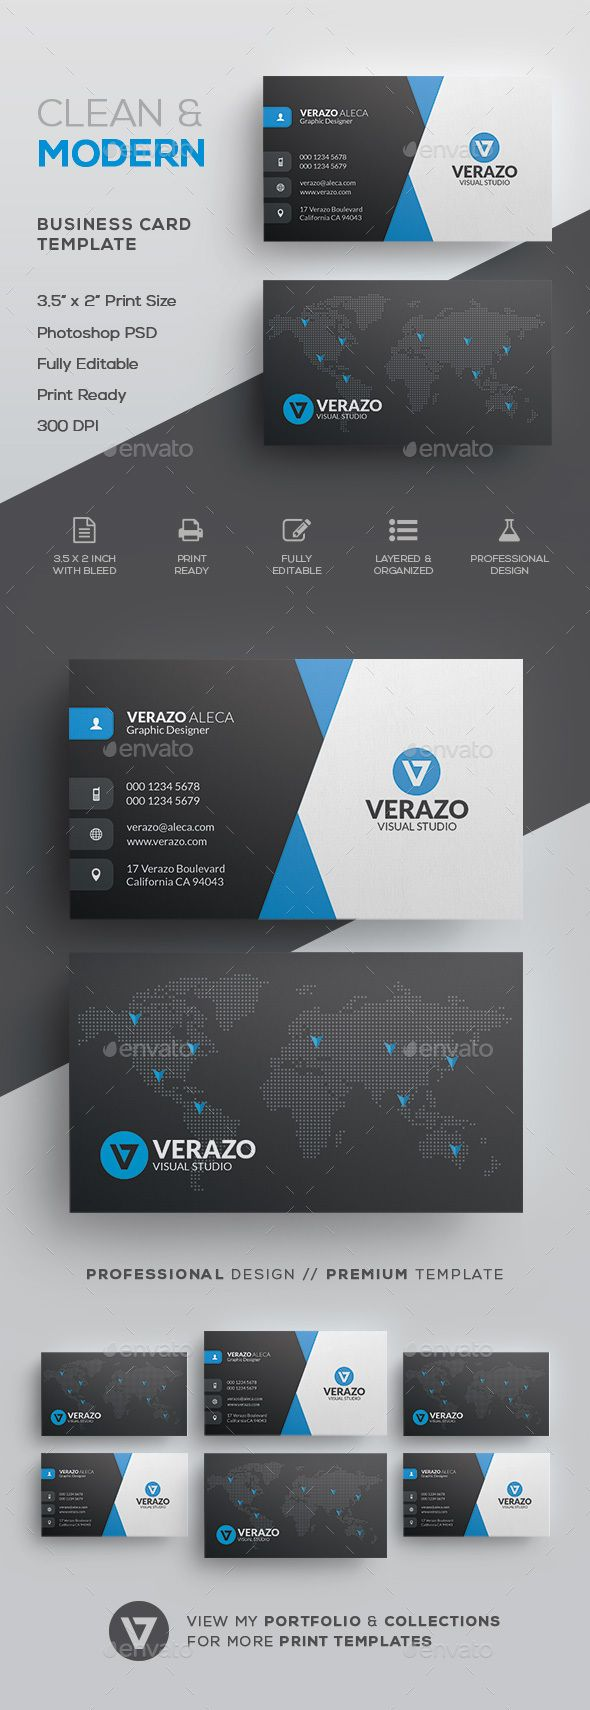 Clean & Modern Corporate Business Card Template - #Corporate #Business #Cards Download here: https://graphicriver.net/item/clean-modern-corporate-business-card-template/19631475?ref=alena994